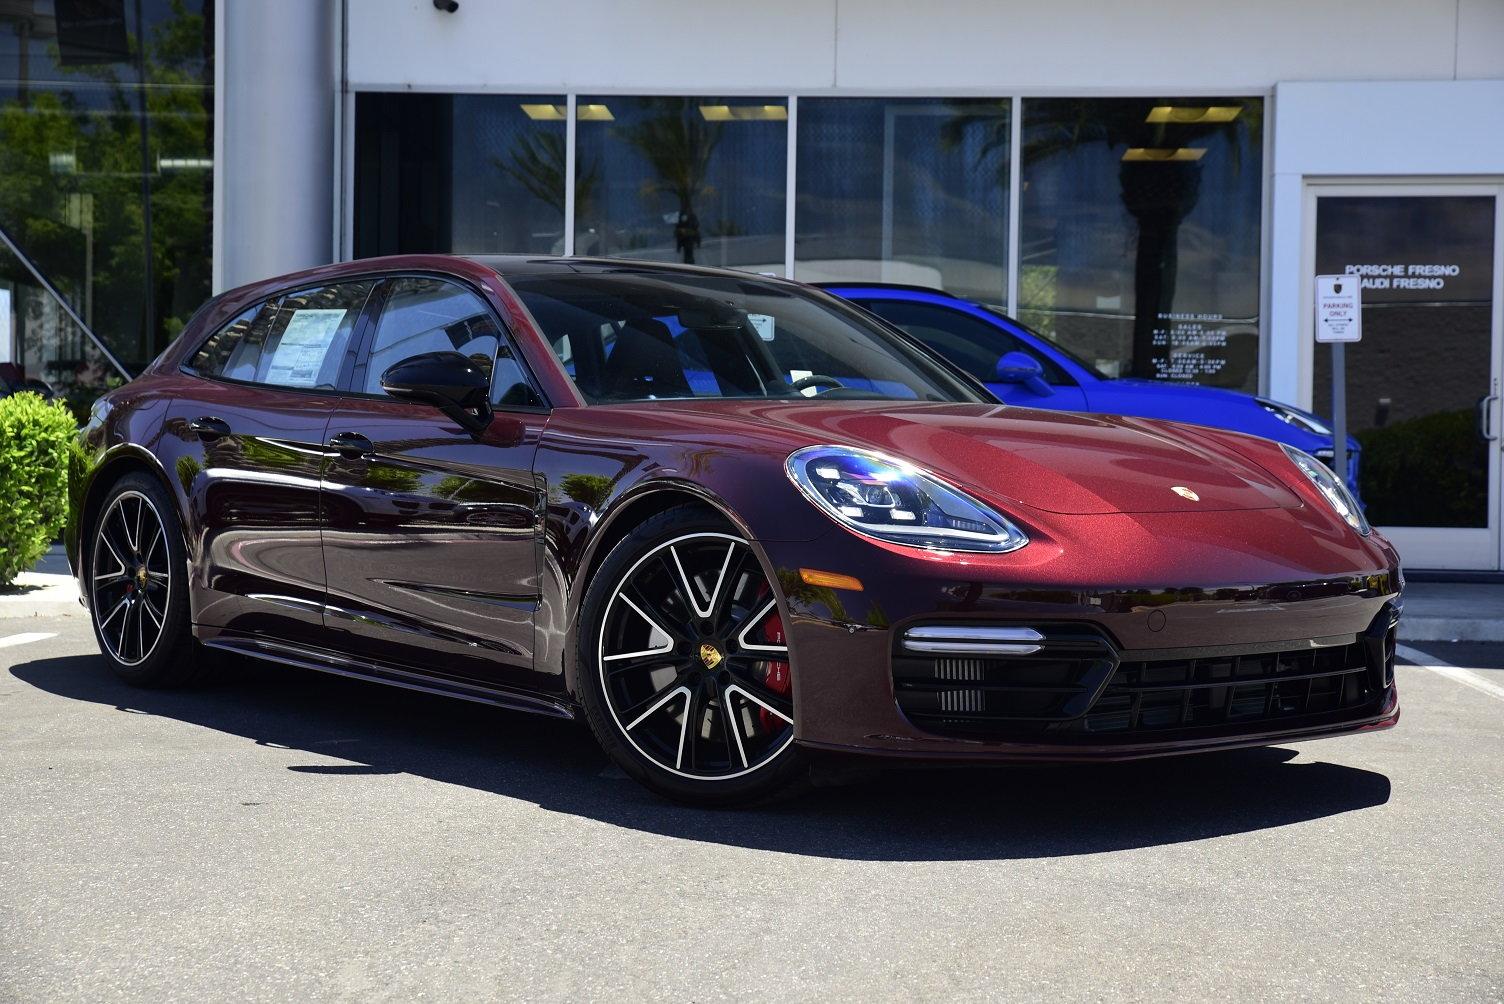 Porsche Panamera Lease >> Dealer Inventory 2018 Porsche Panamera Sport Turismo Turbo - Rennlist - Porsche Discussion Forums